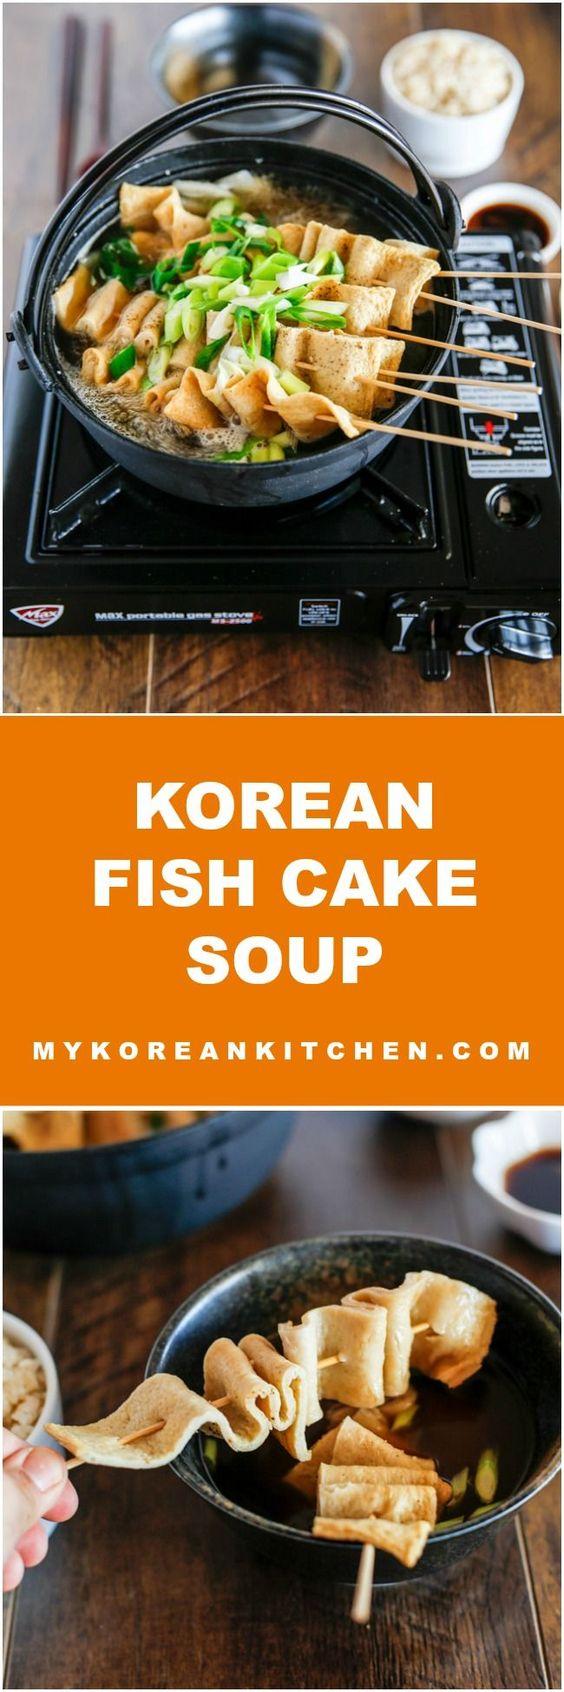 Korean fish cake soup recipe for Korean fish cake